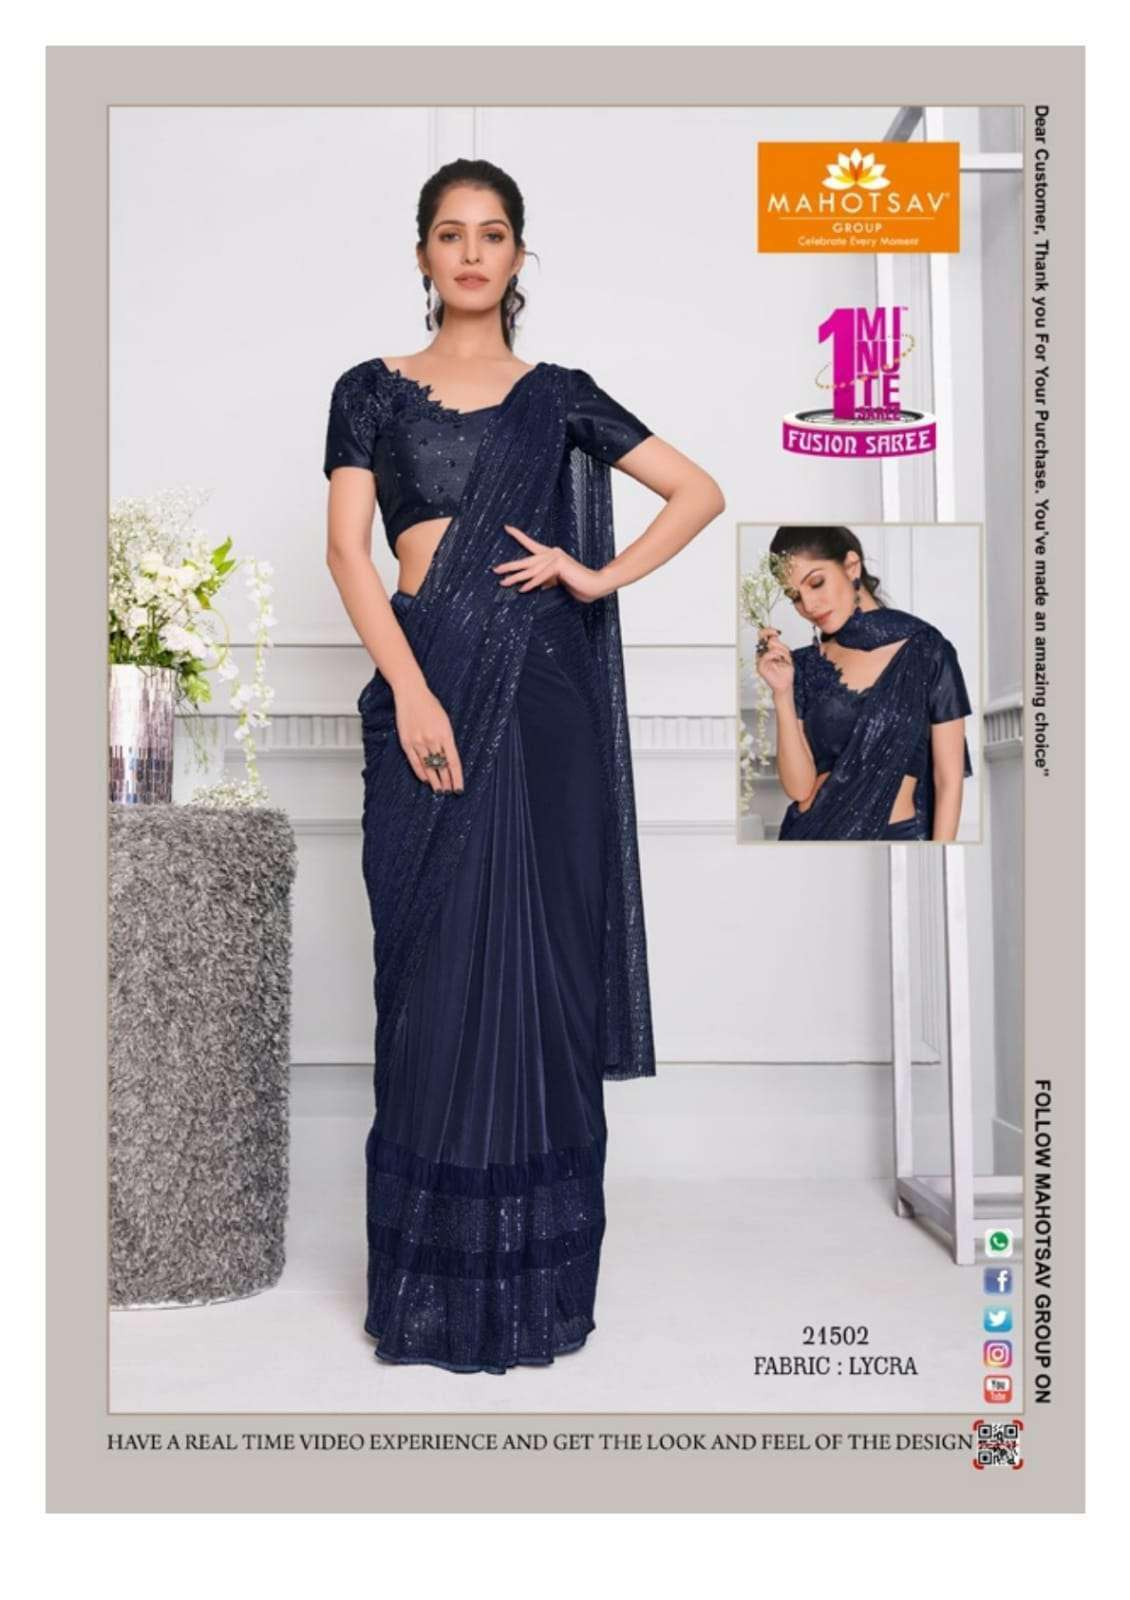 Mahotsav Moh Manthan Izzara 21501 To 215018 Series Fancy Designer Sarees Collection 21502